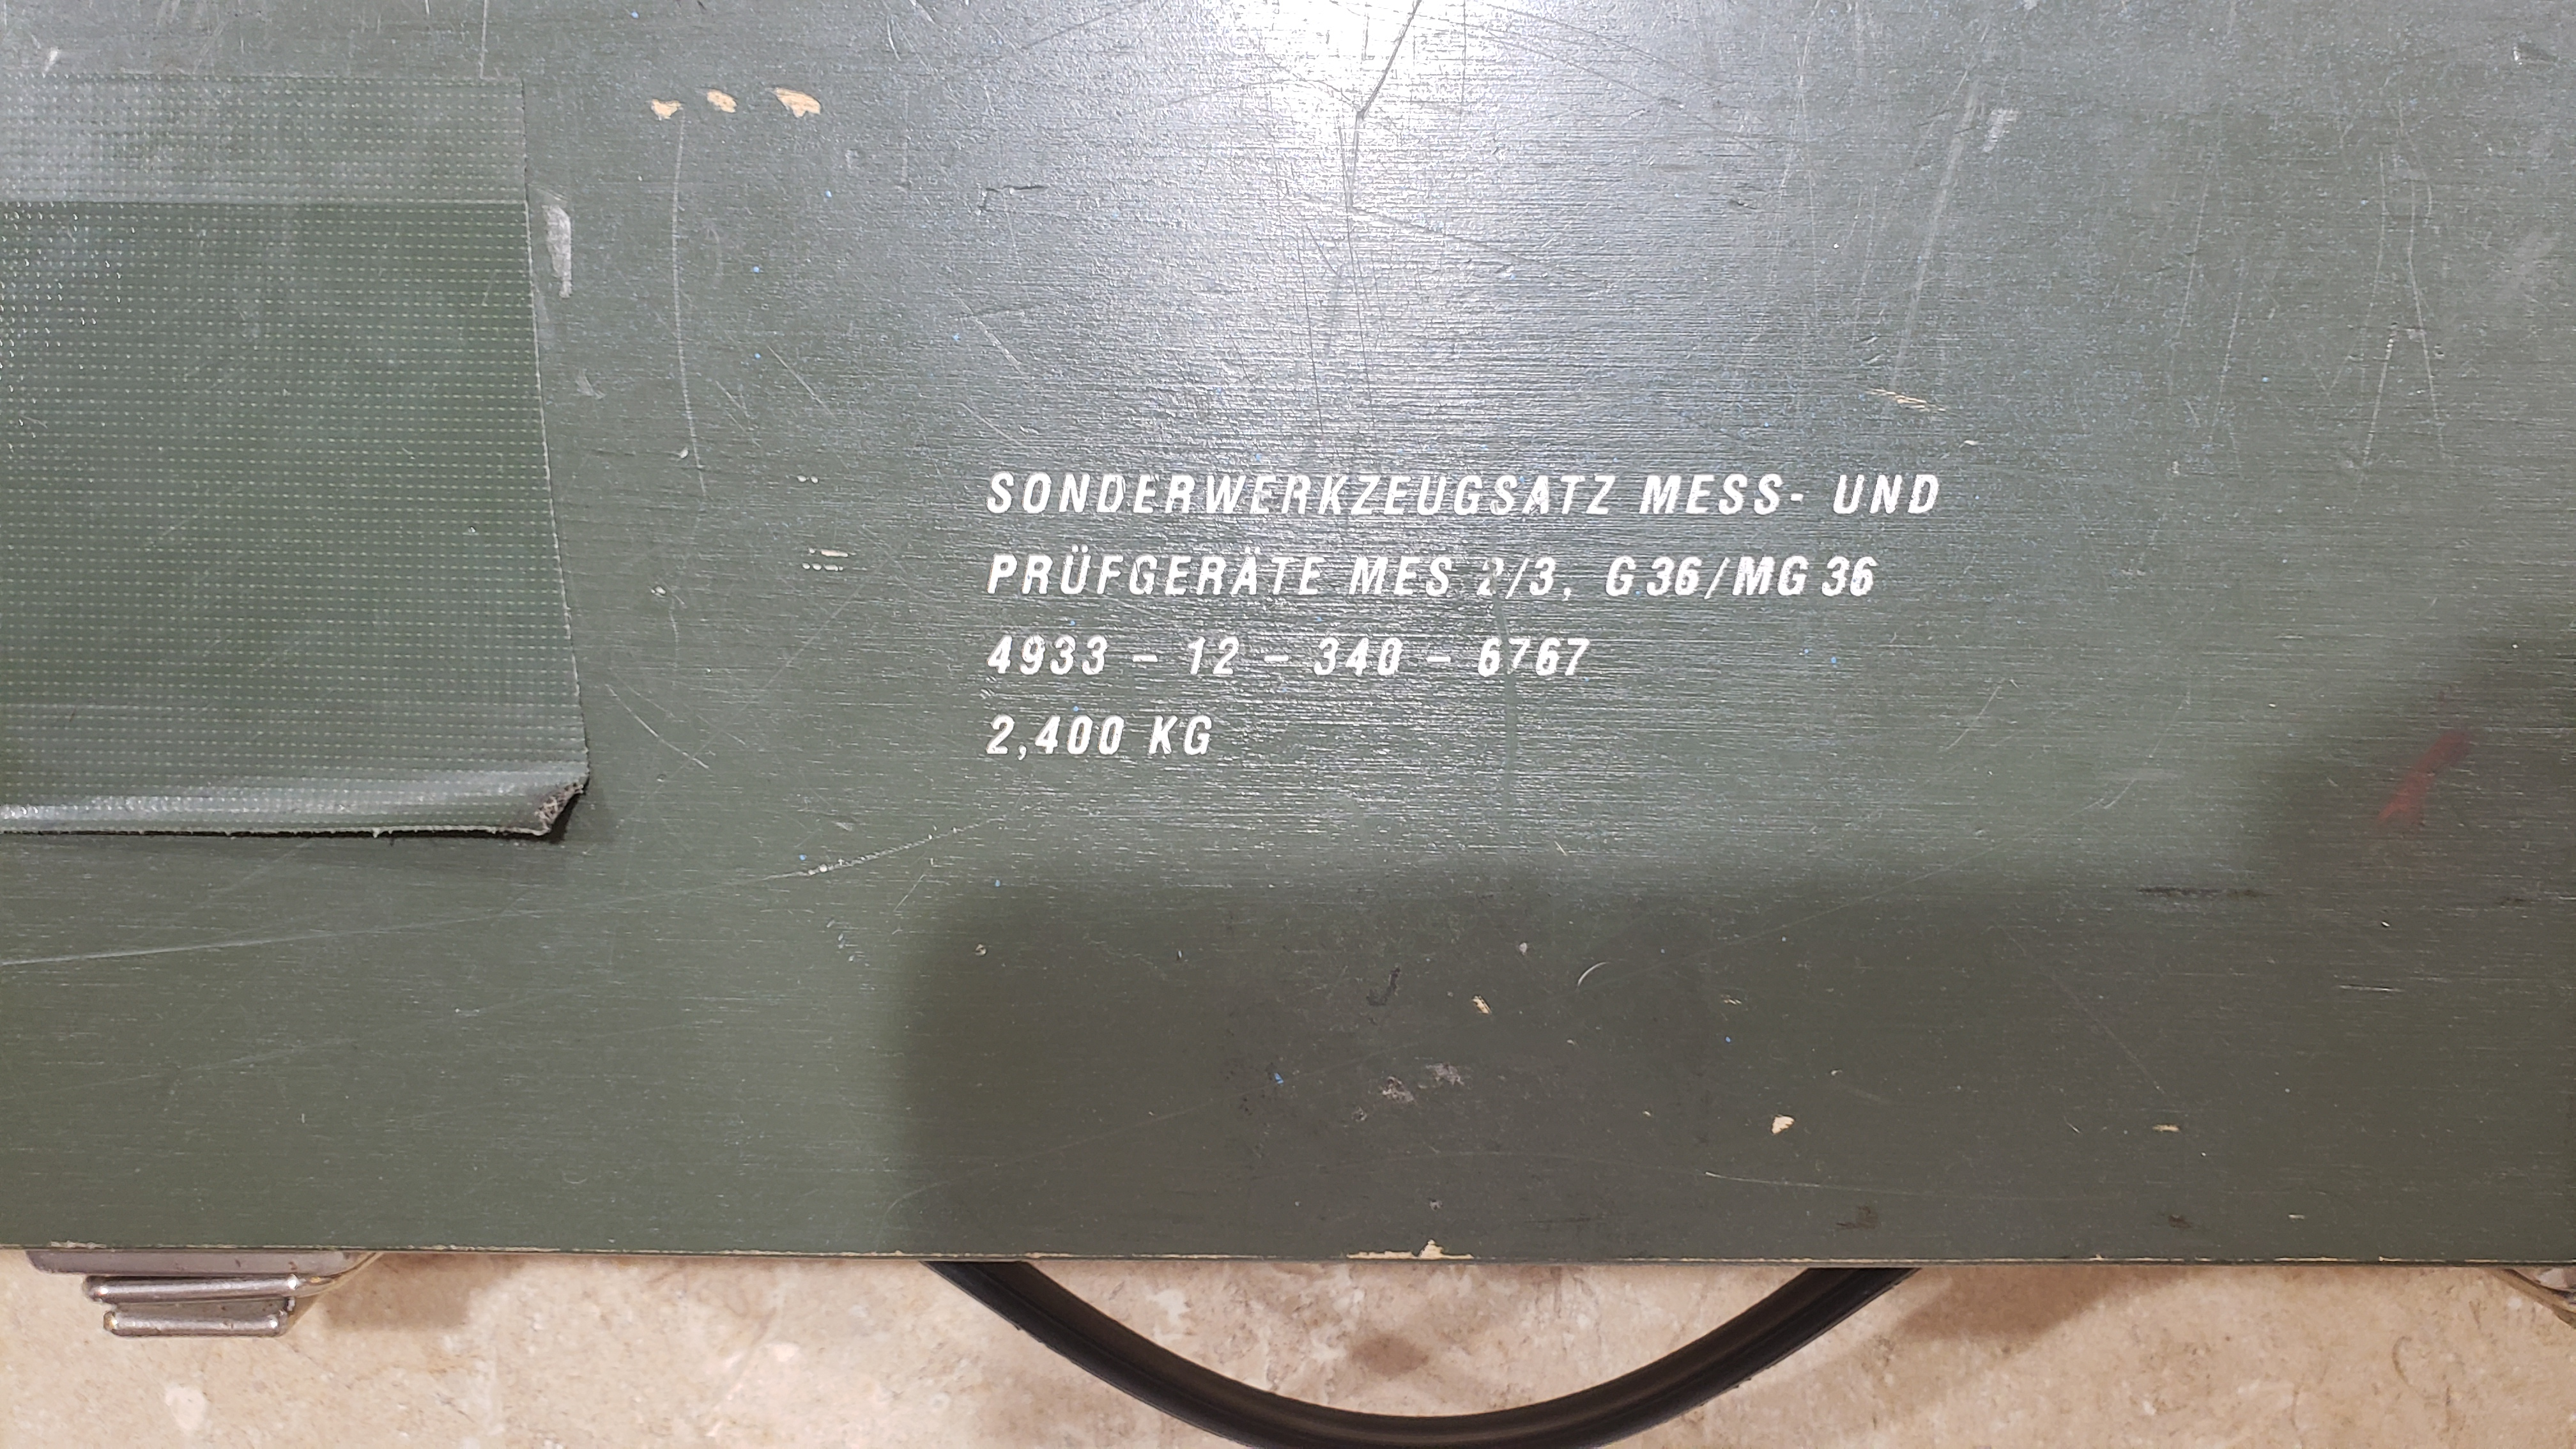 WTS: C93 Furniture, LDI MP5 Vis laser, A3 Pistol Brace, G36 Armorer's Kit *New Items*-g36-1.jpg